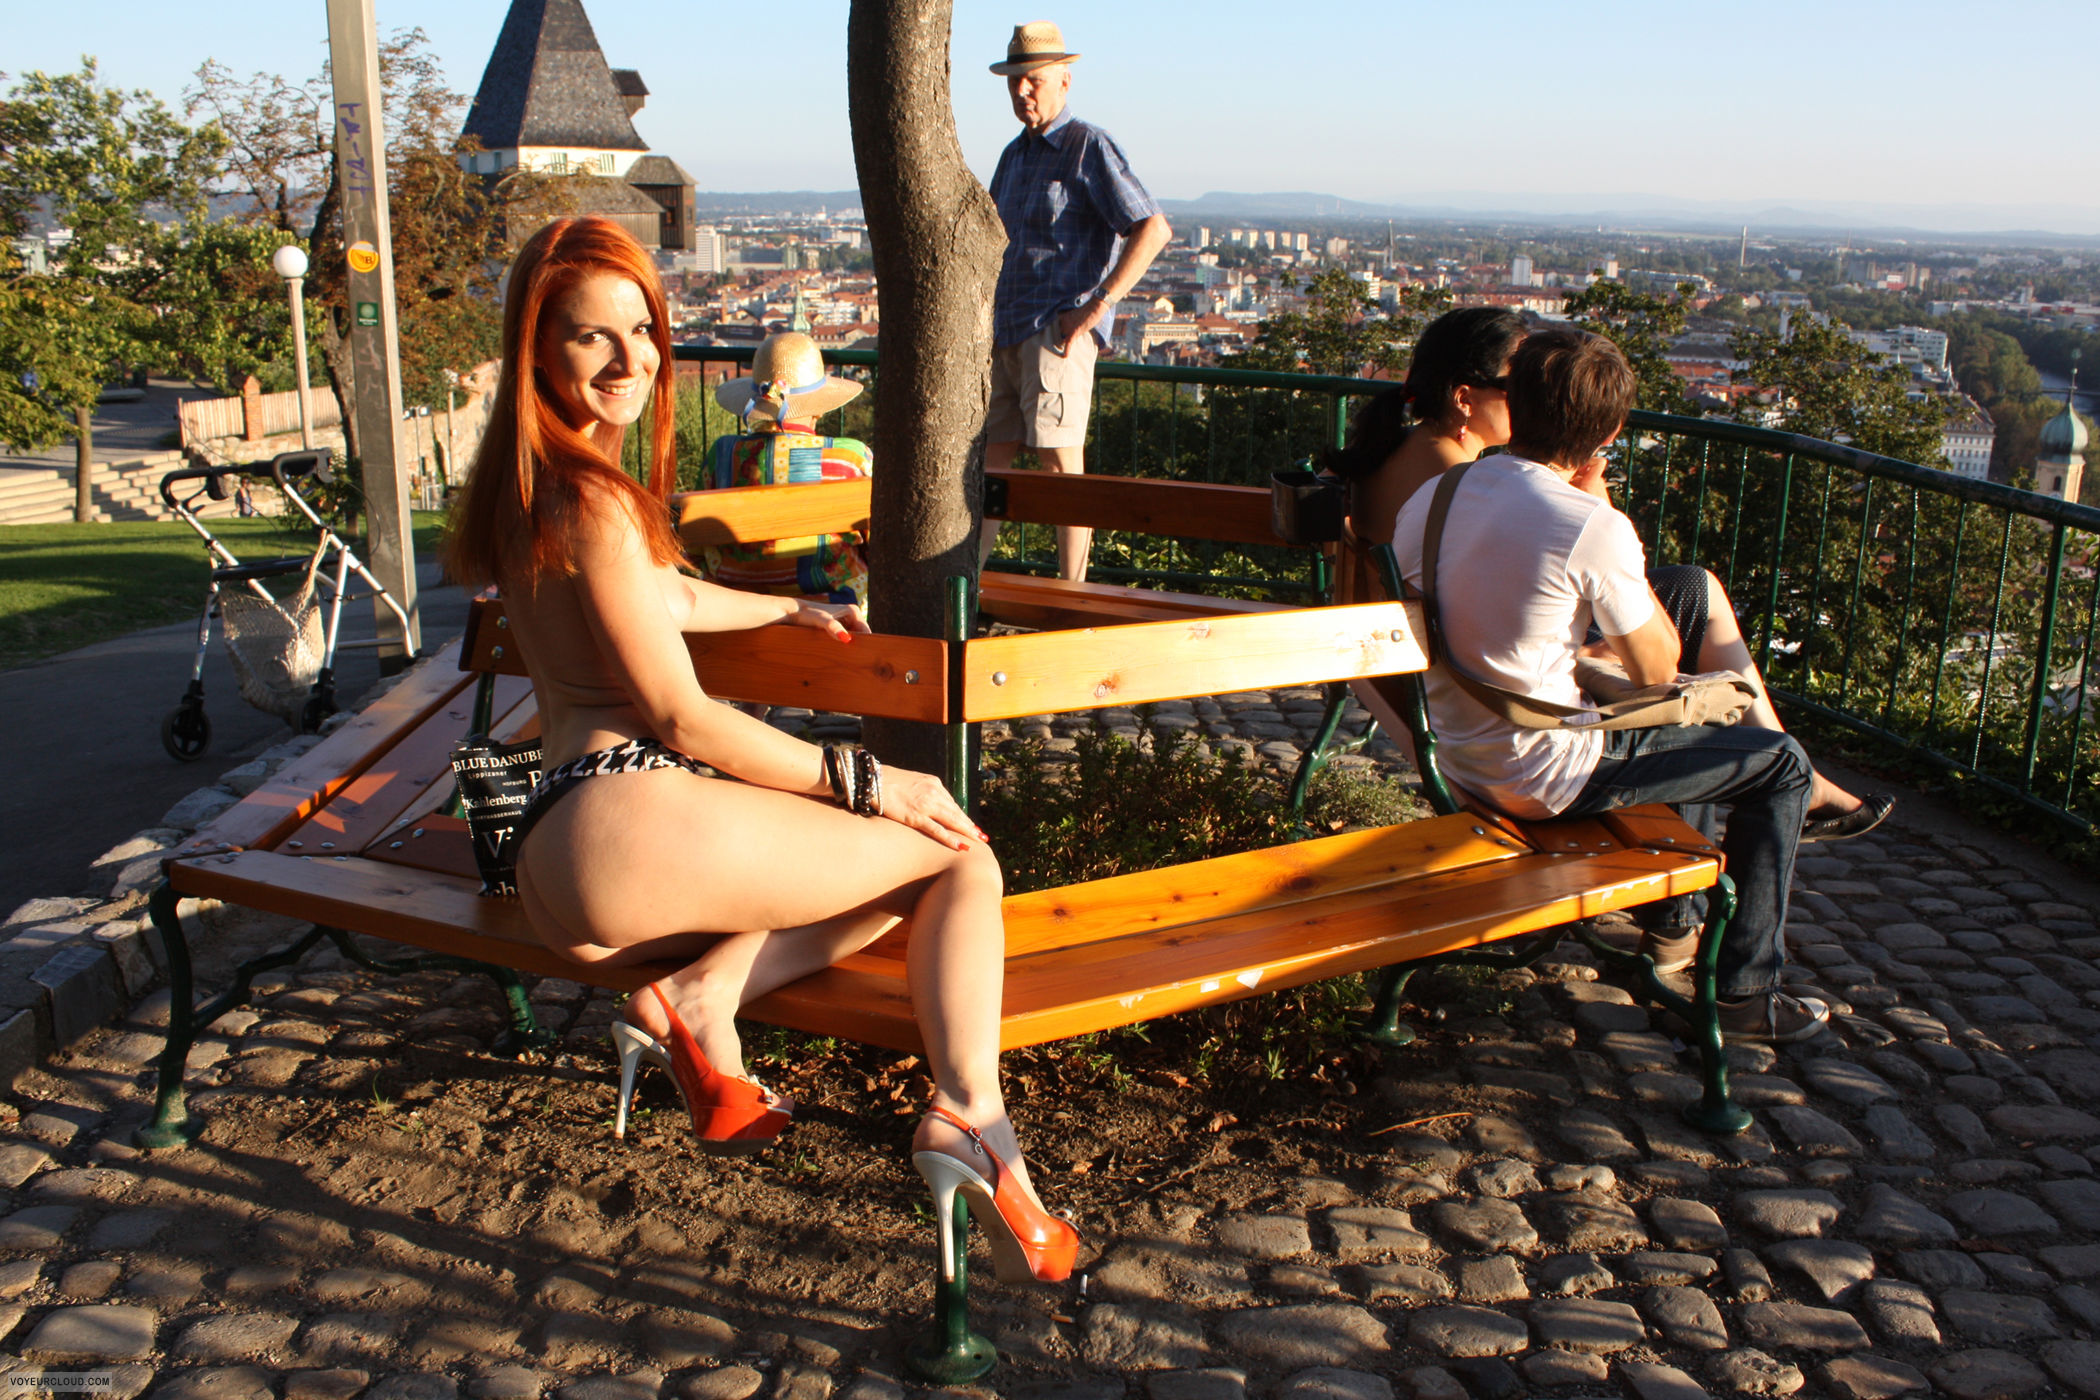 vienna-austria-styria-public-nude-07